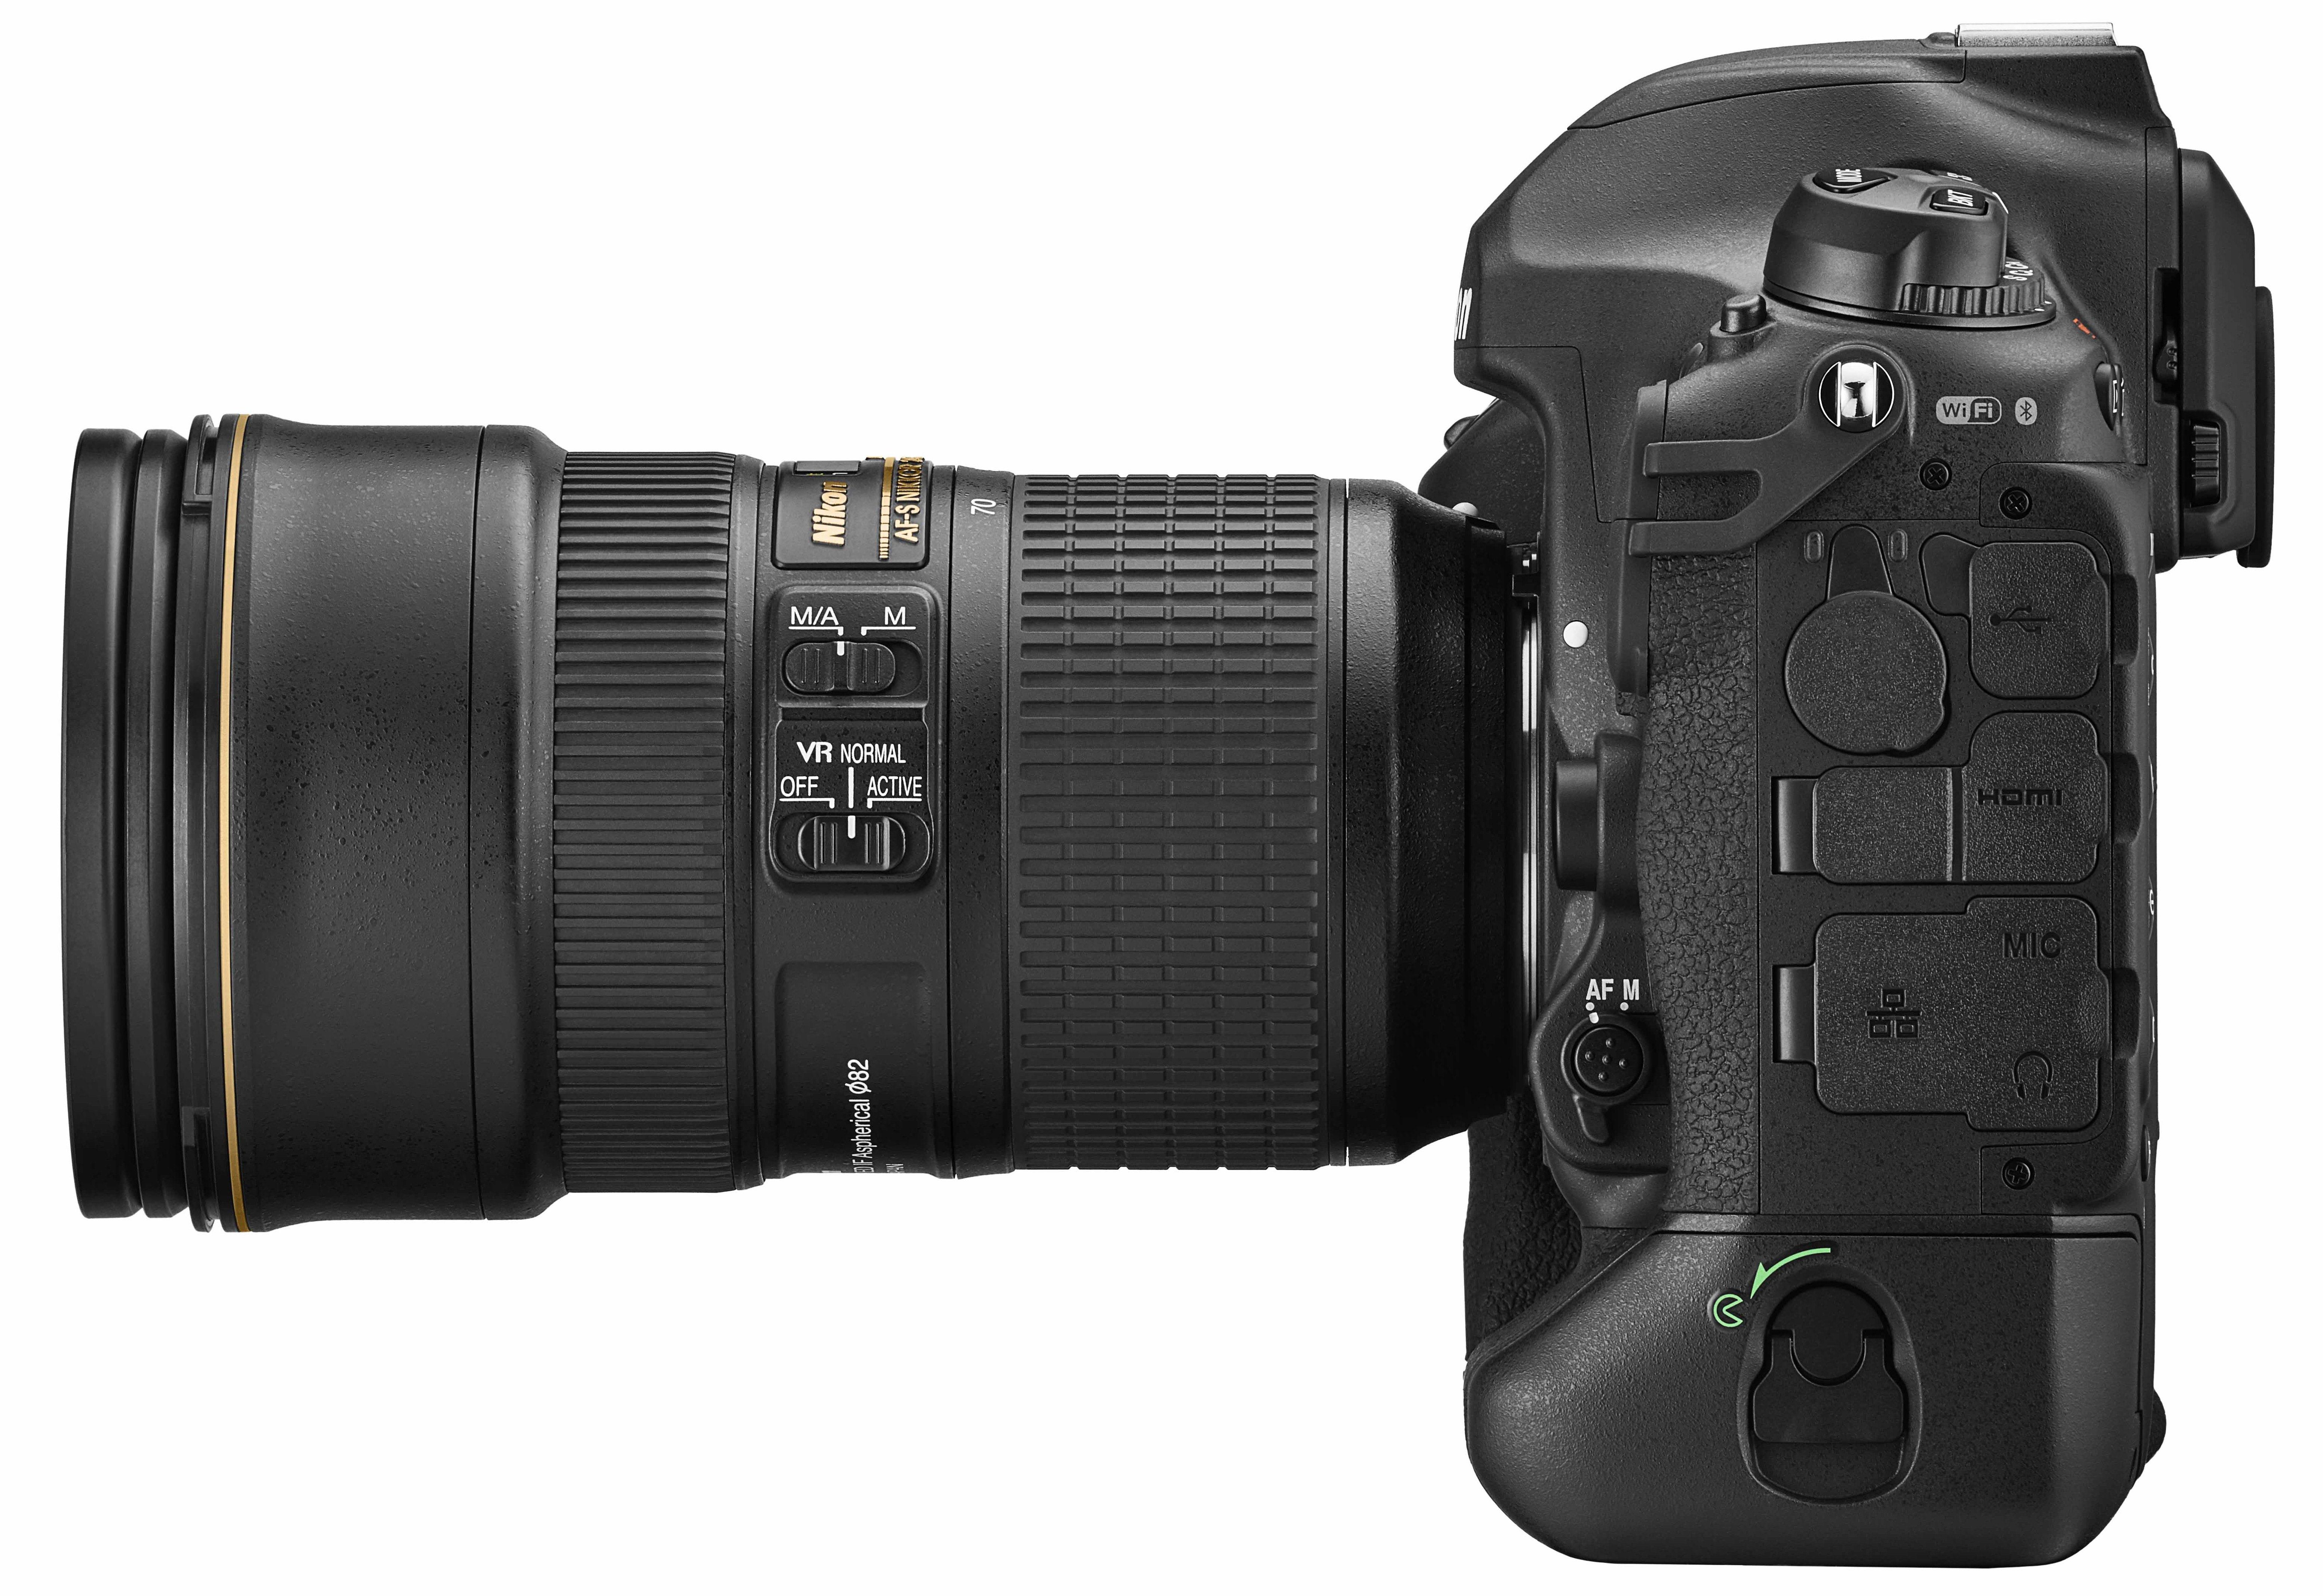 Nikon D6: Setting new standards for autofocus performance